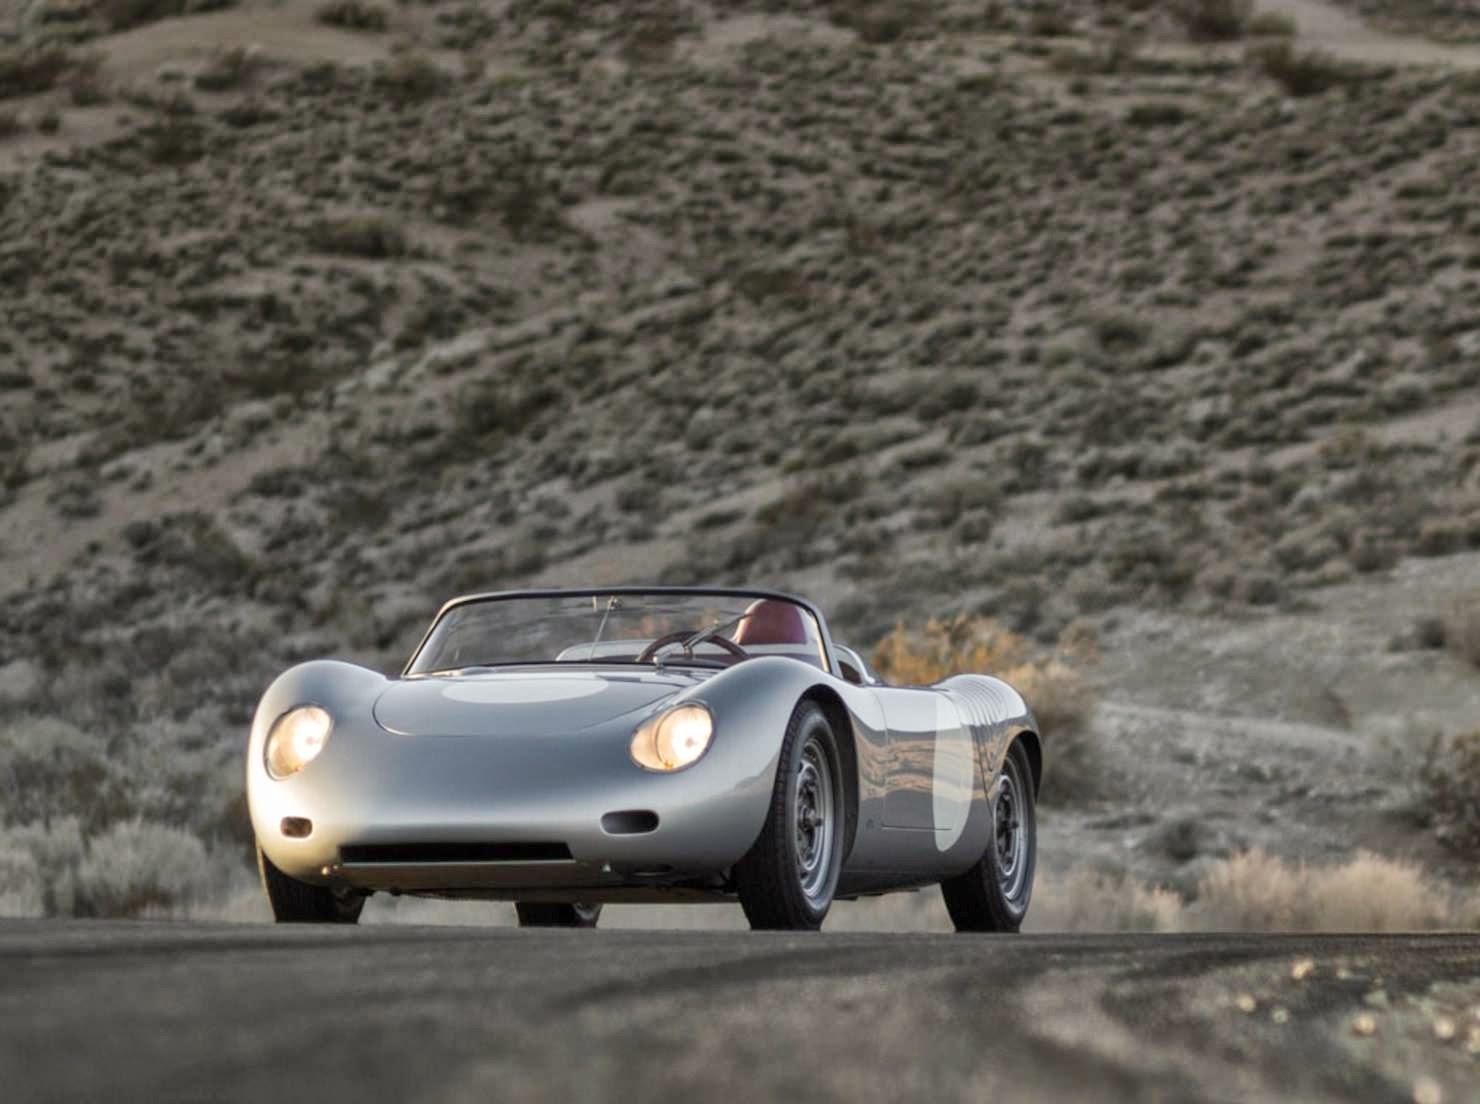 http://carbrandsincurrentproduction.blogspot.com.es/search/label/Porsche%20718%20Replica